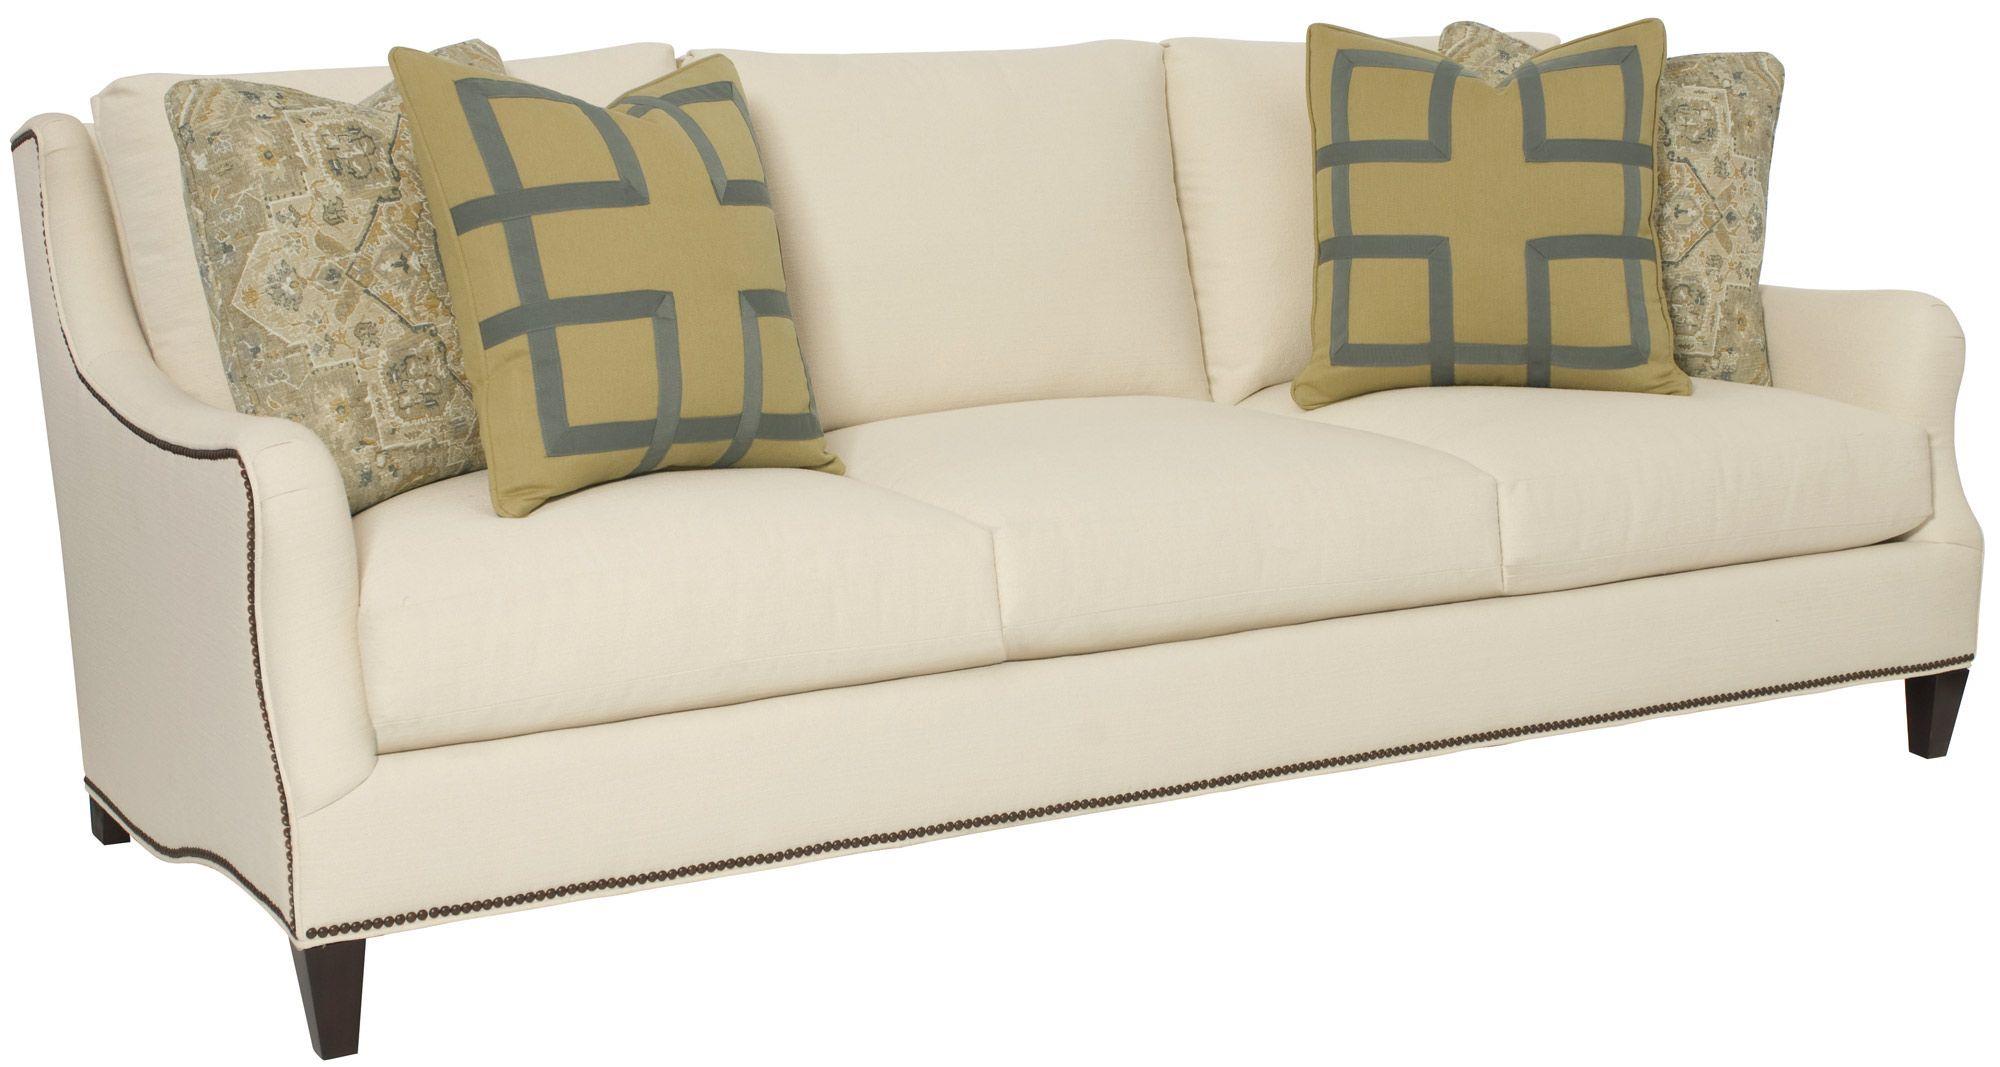 Hamilton Sofa 91x41.5 x 35h Hamilton sofa, Sofa